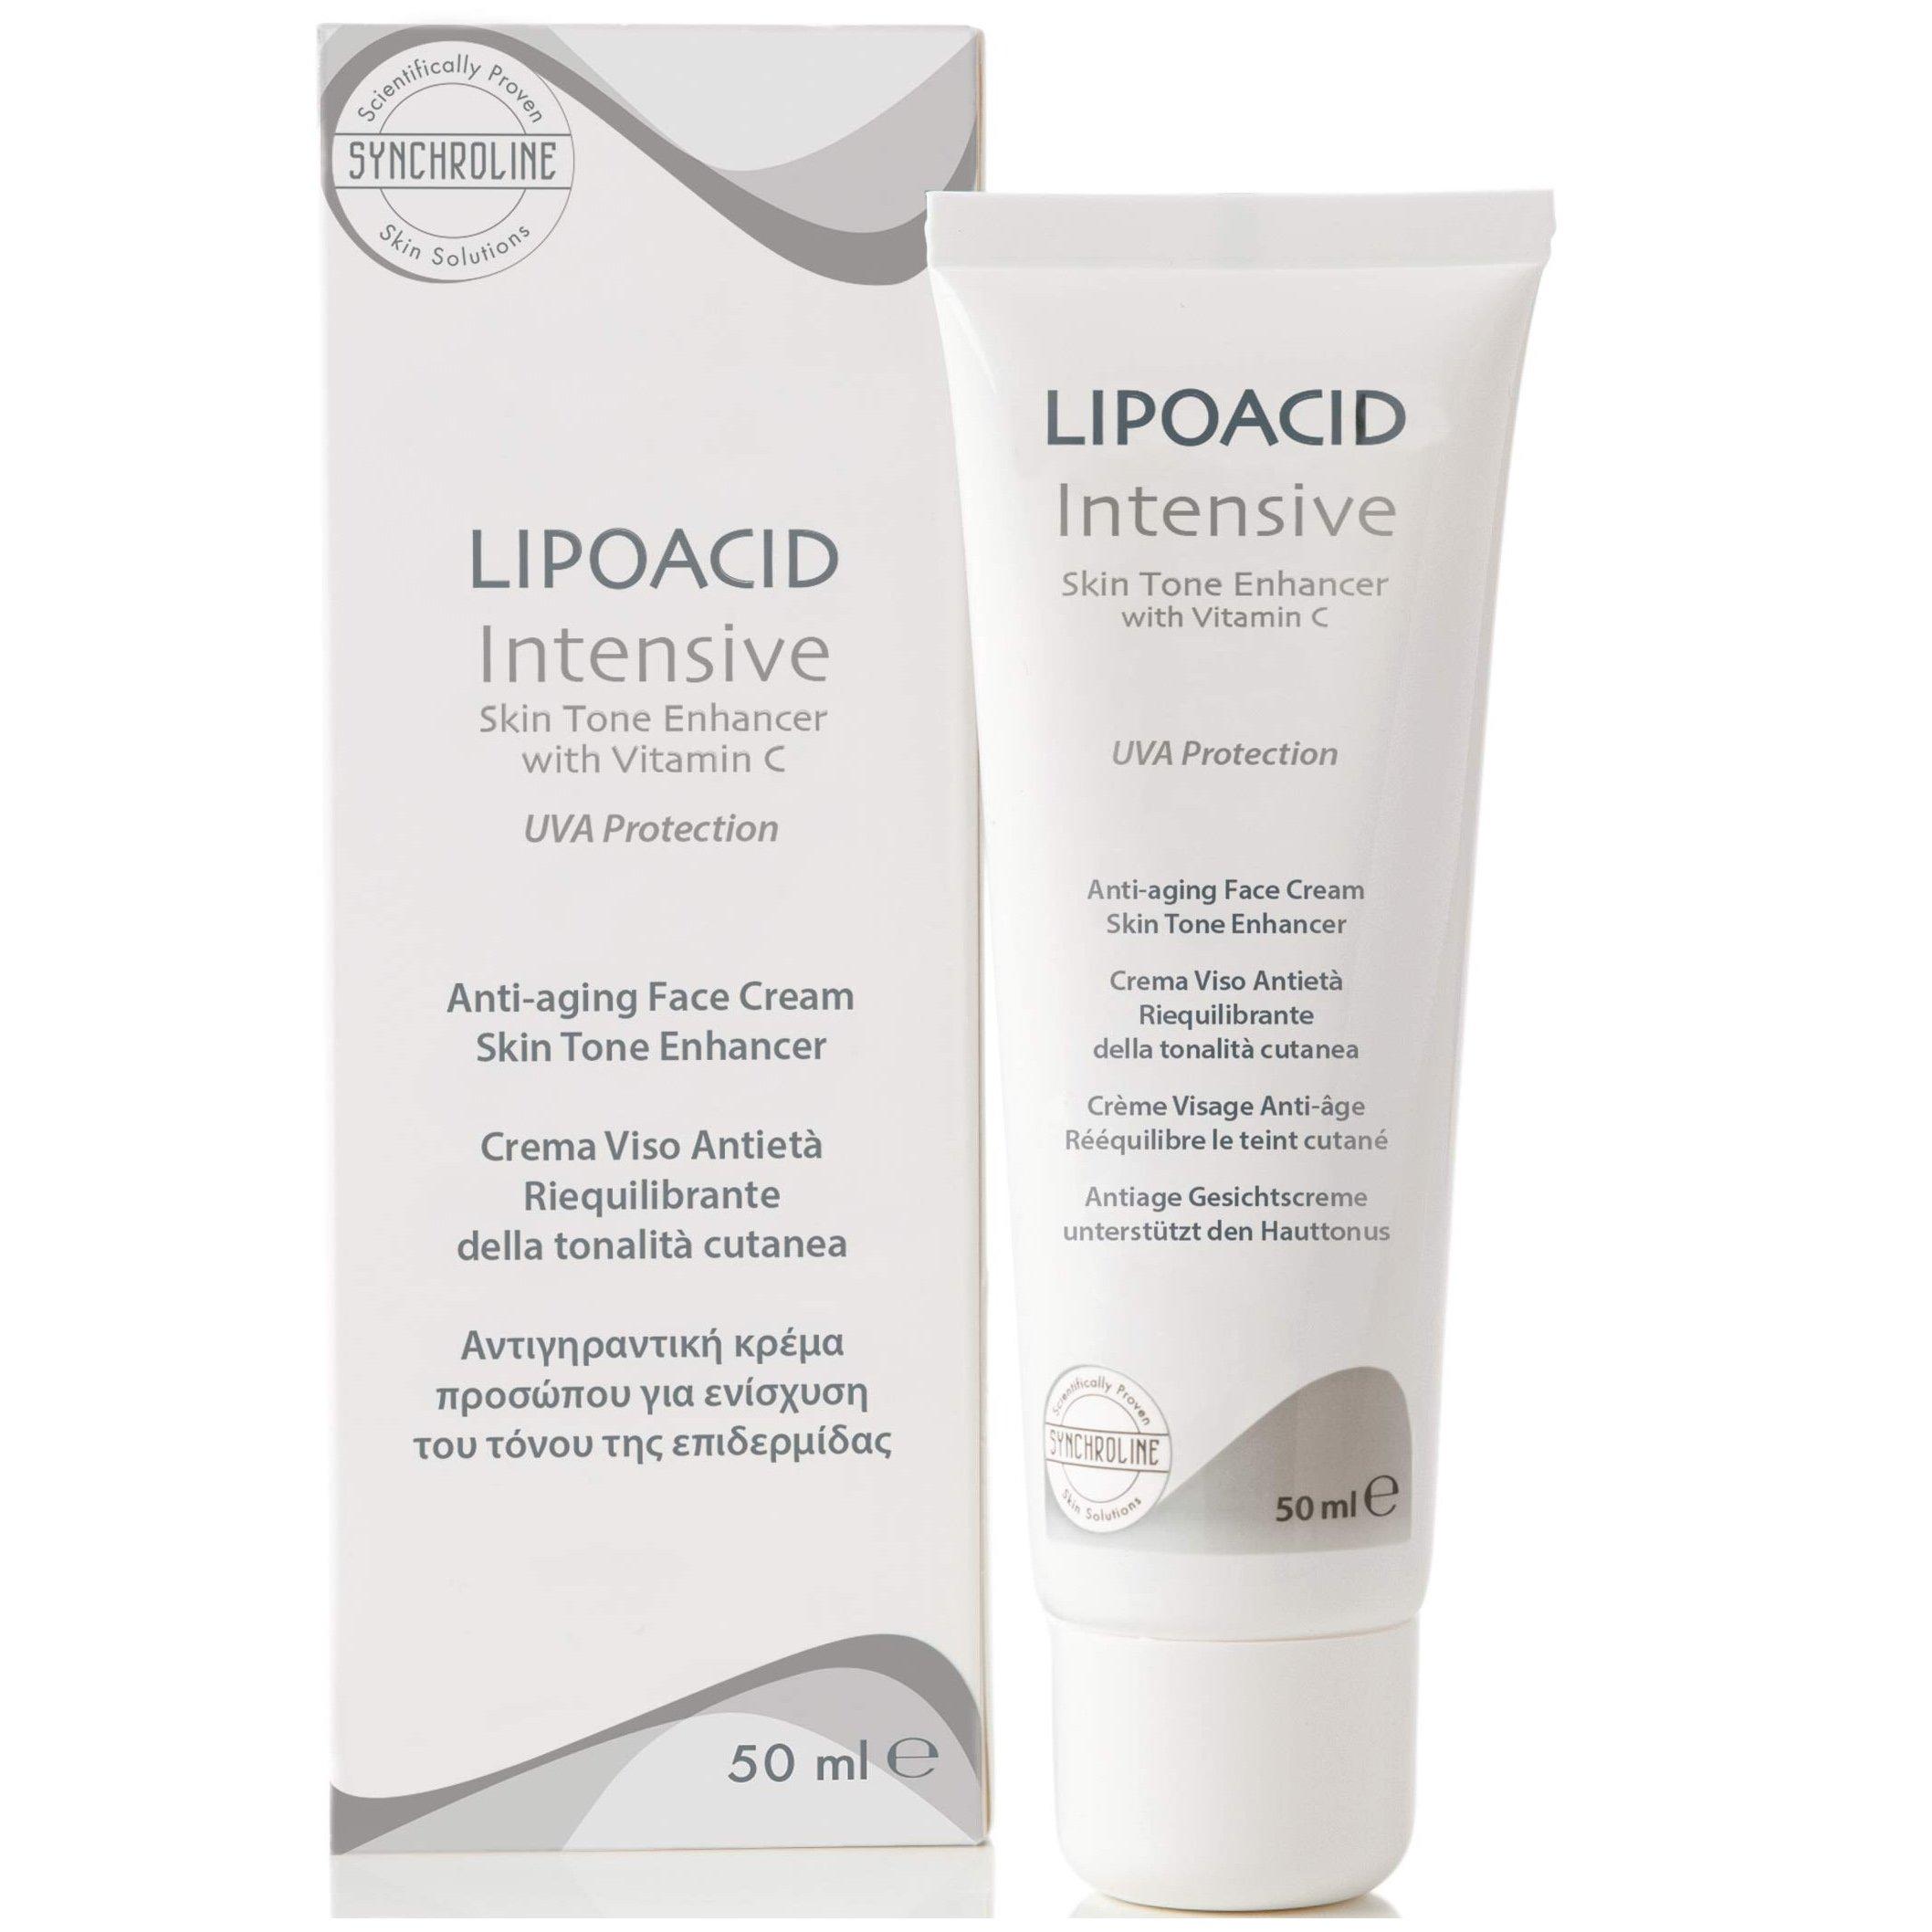 Synchroline Intensive Lipoacid Face Cream Κρέμα Προσώπου και Λαιμού με Λιποϊκό Οξύ και Βιταμίνη C 50ml